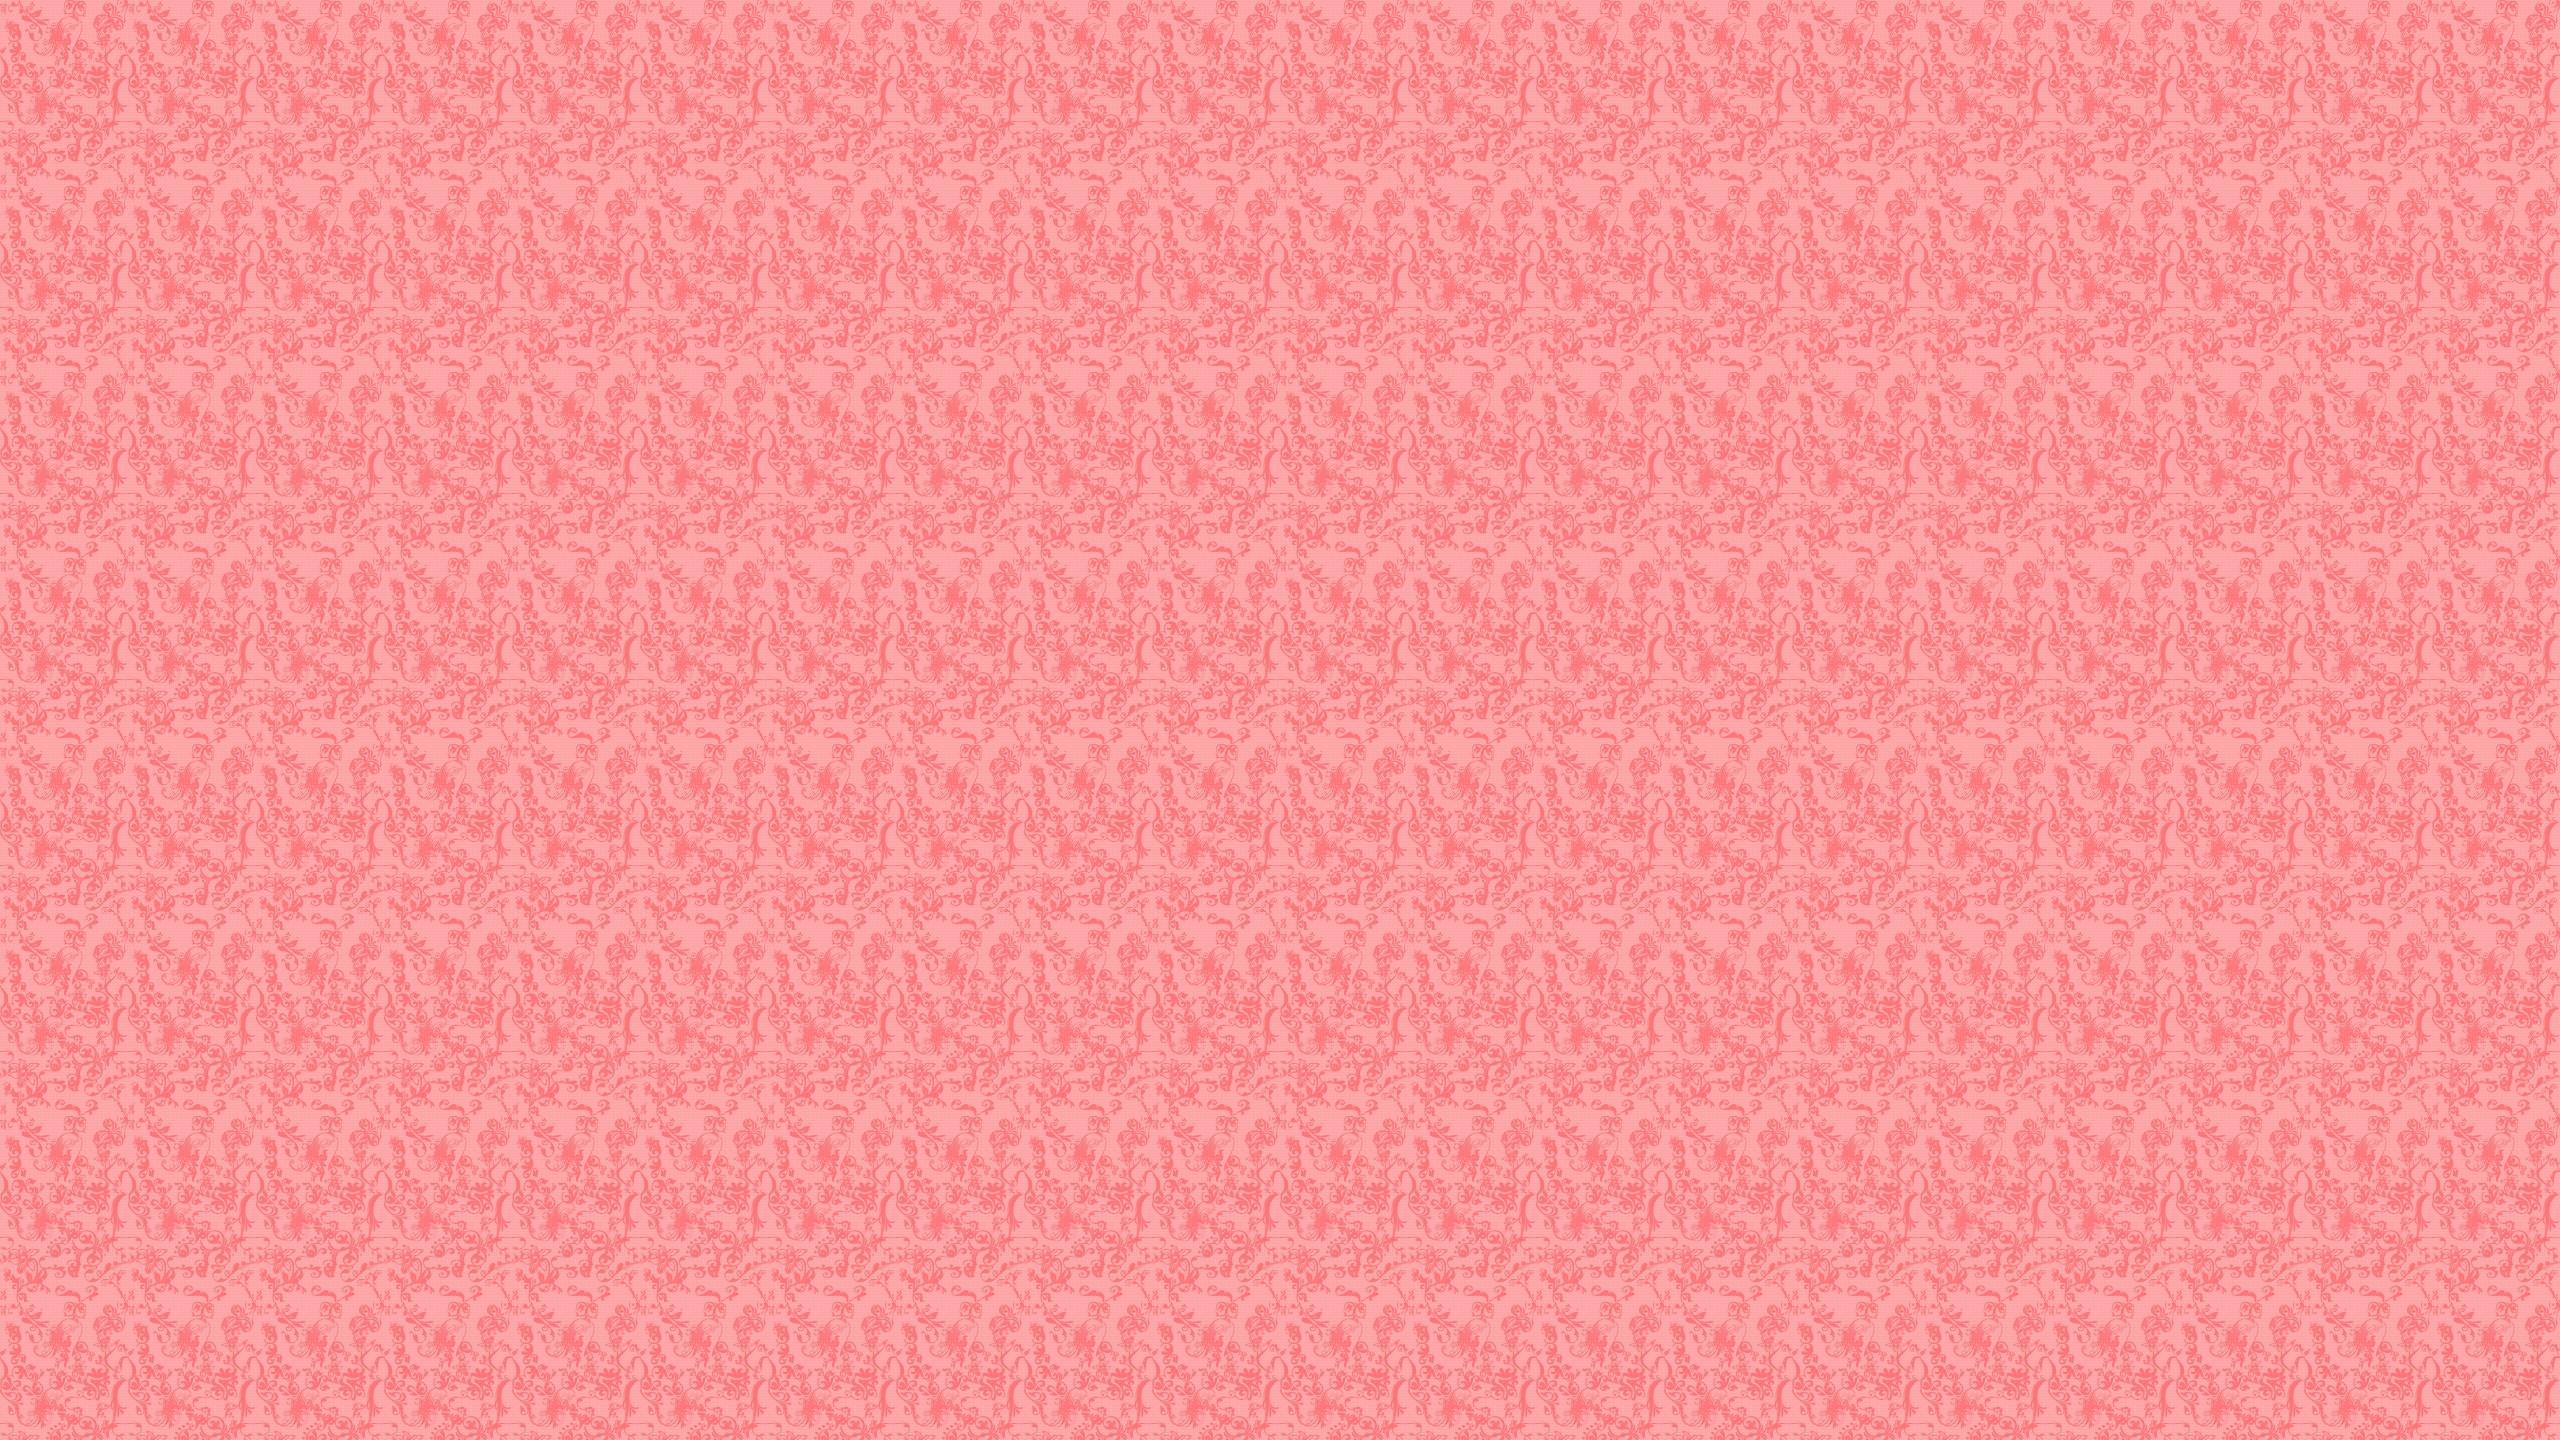 Cute Goth Pink Galaxy Kawaii Wallpaper Pastel Pink Vintage